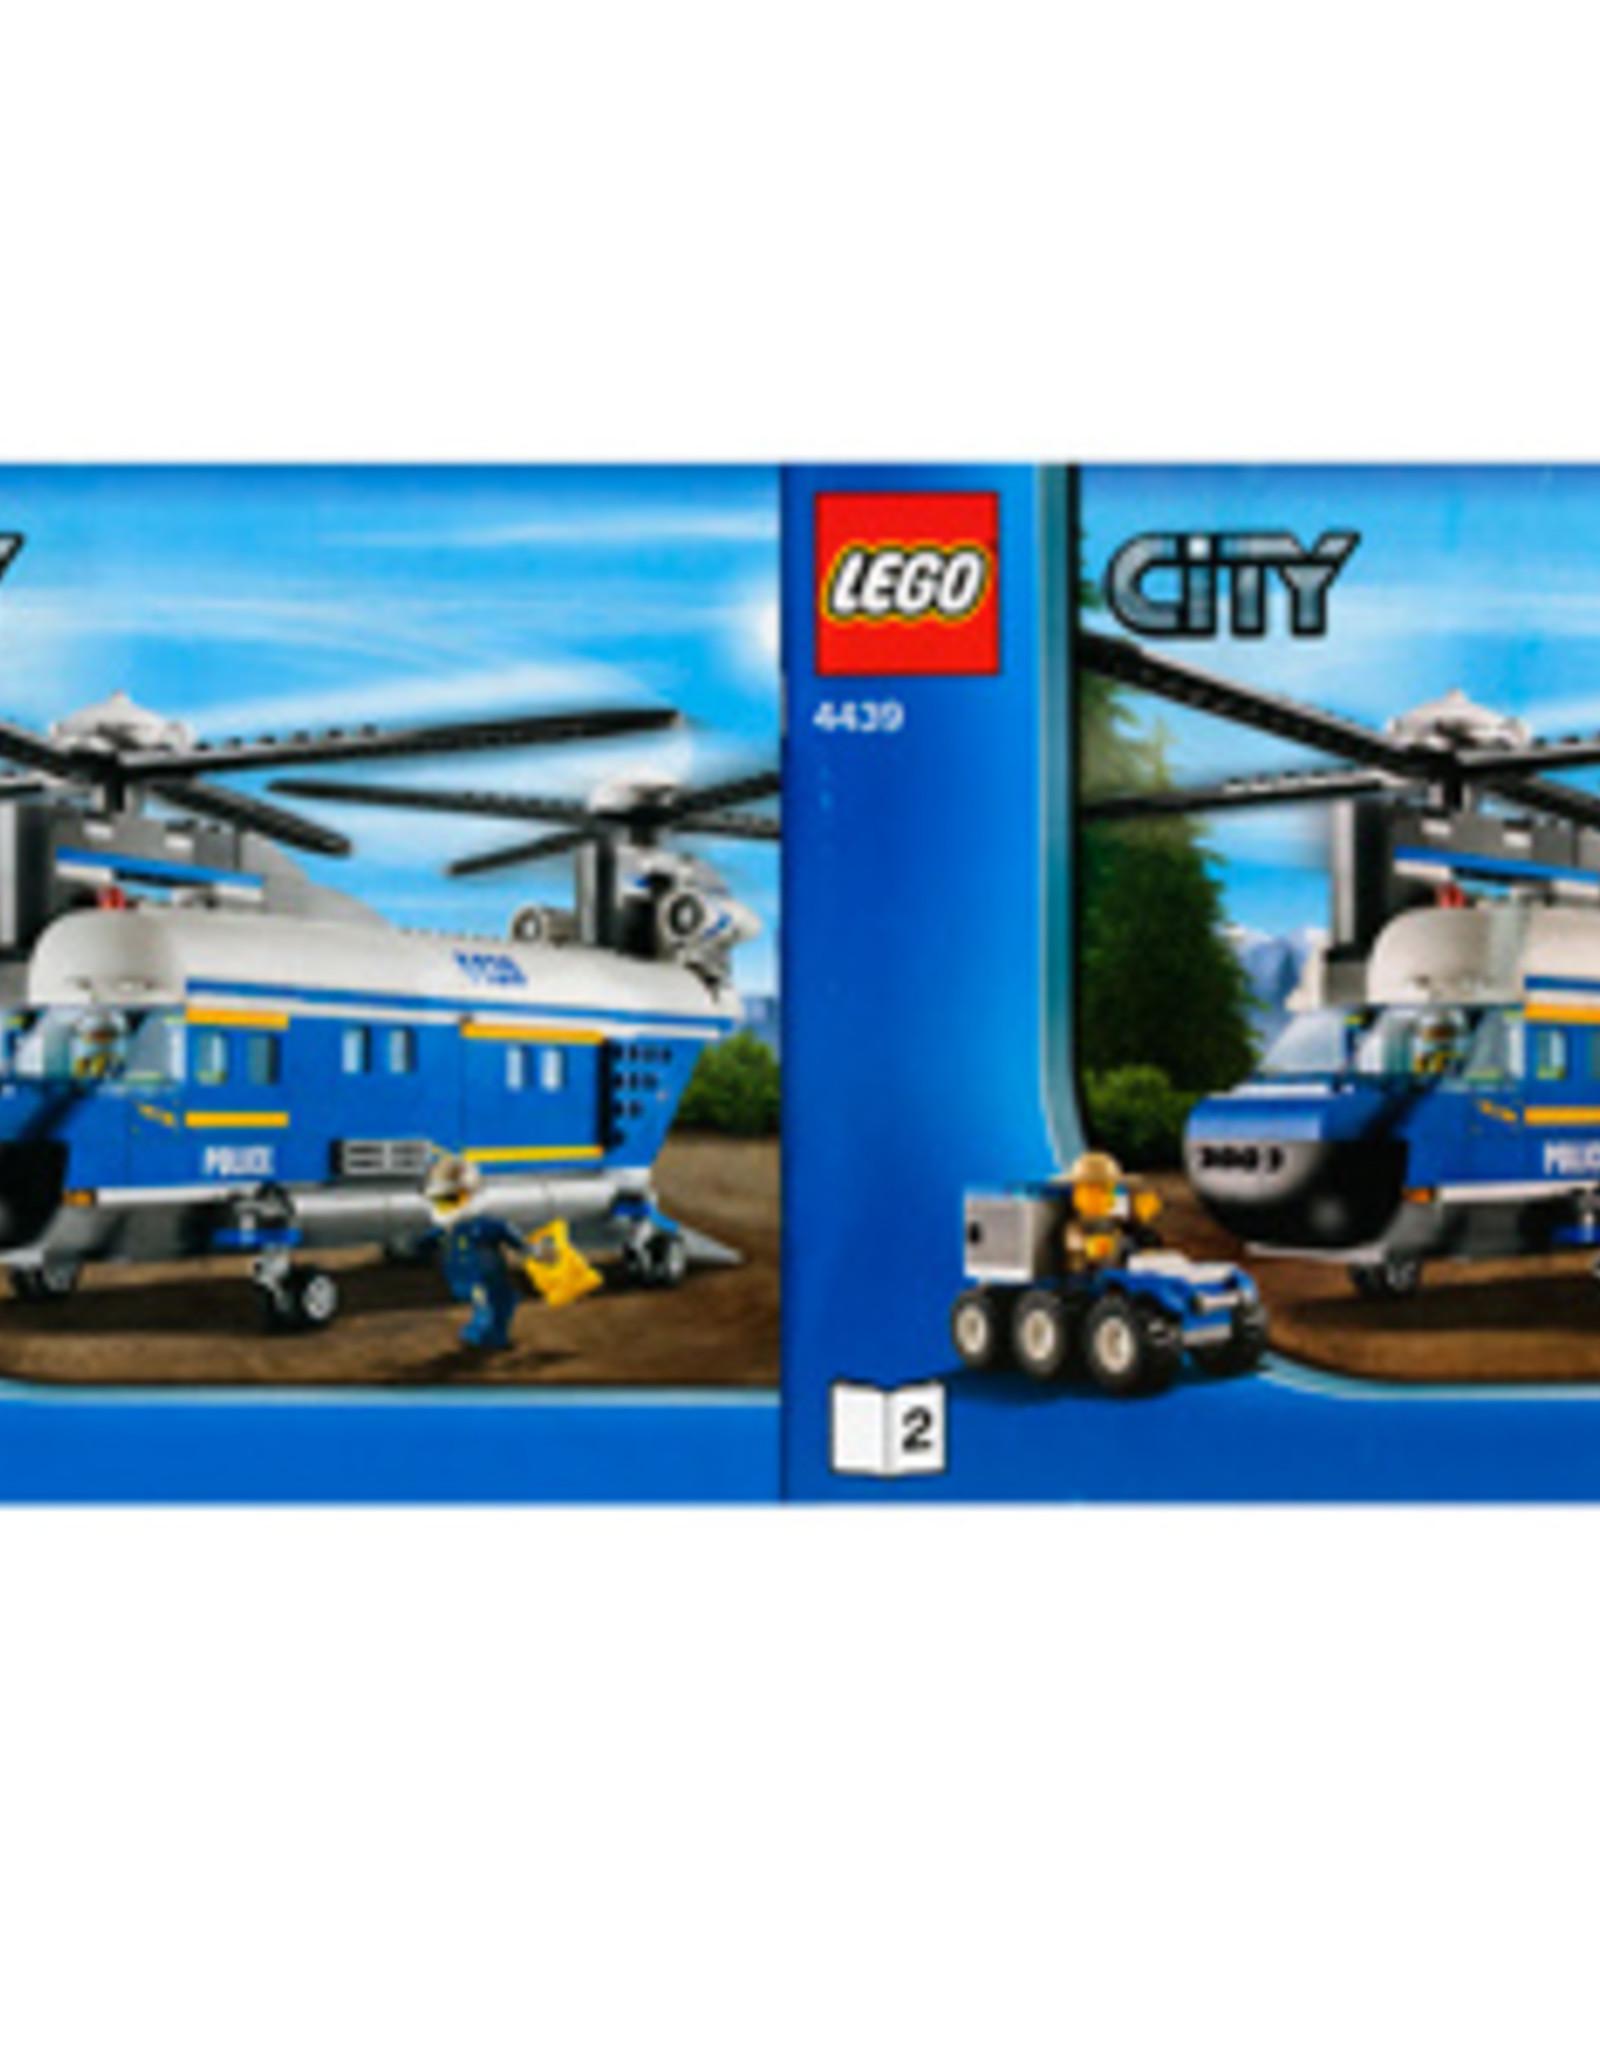 LEGO LEGO 4439 Politie Vrachthelicopter XL CITY